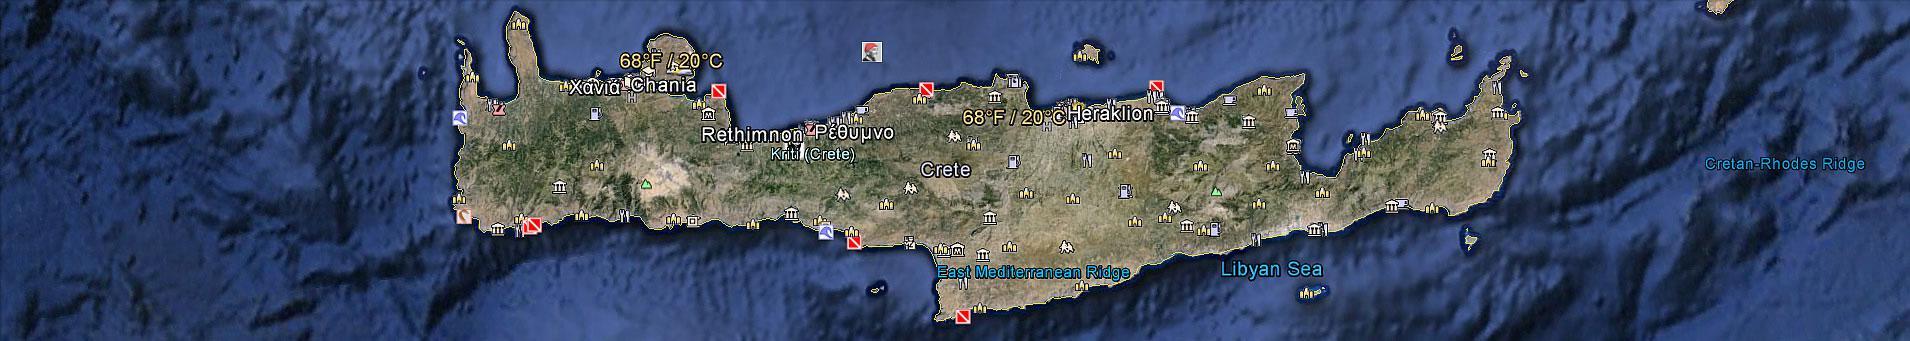 Crete Greece Map